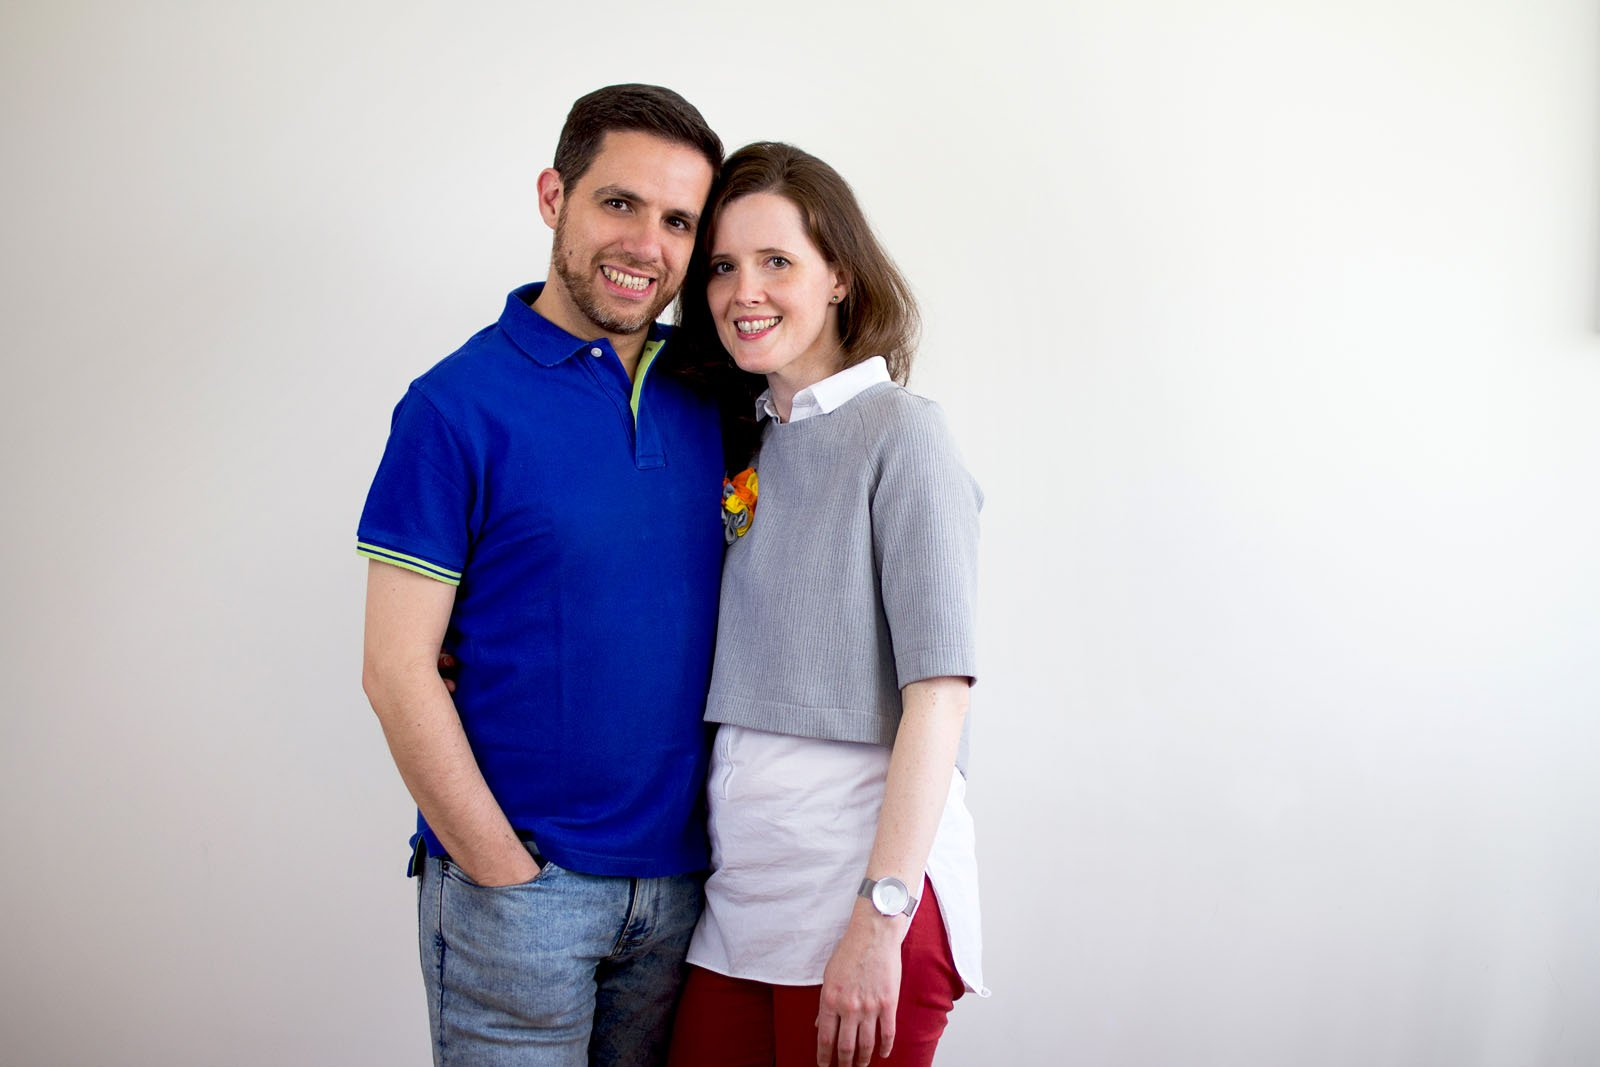 matrimonioenpositivo consejos matrimonio